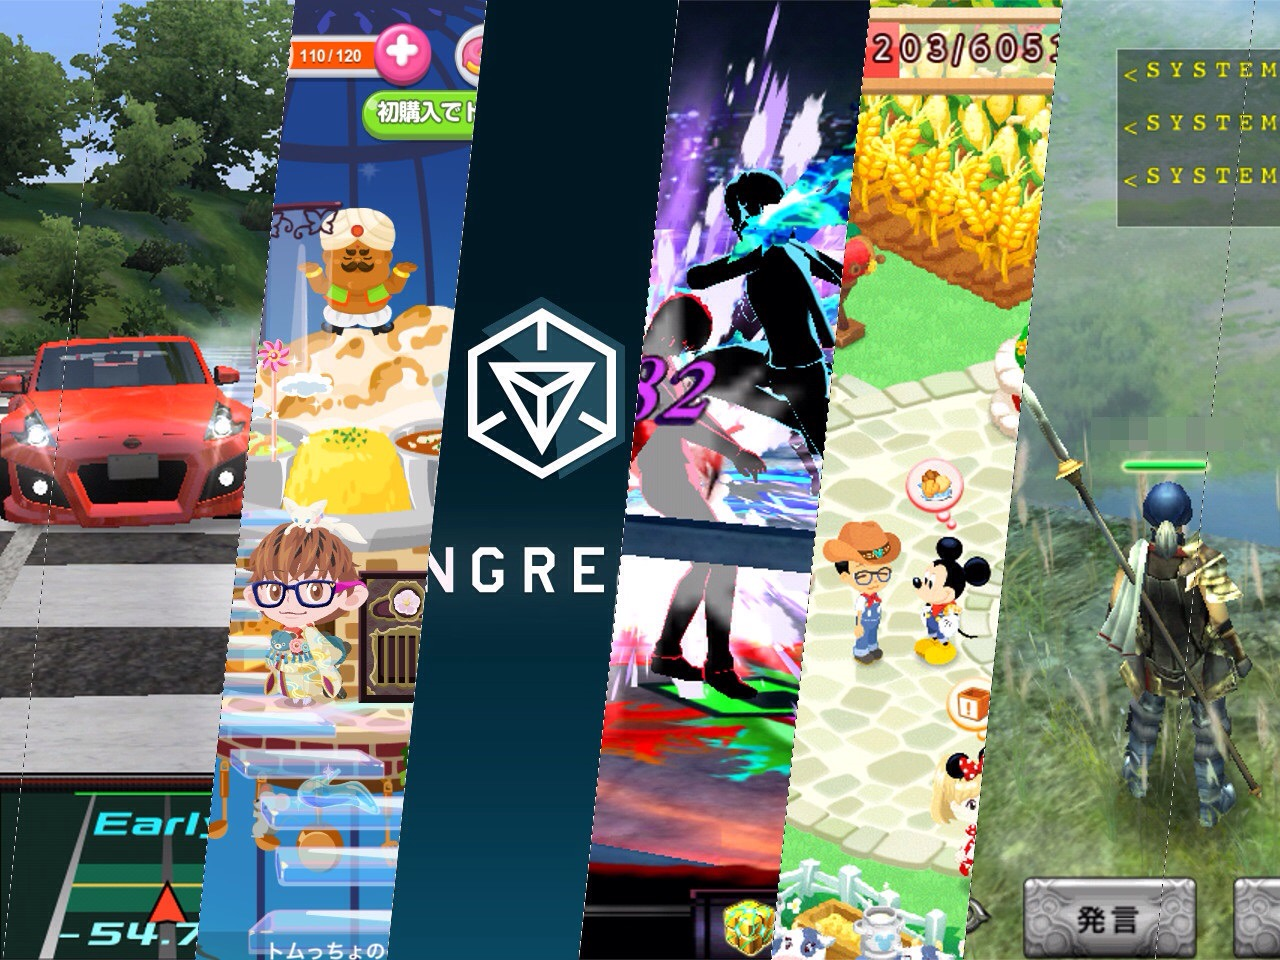 G.W.に私が遊び倒すことになるであろう6つのゲームアプリ